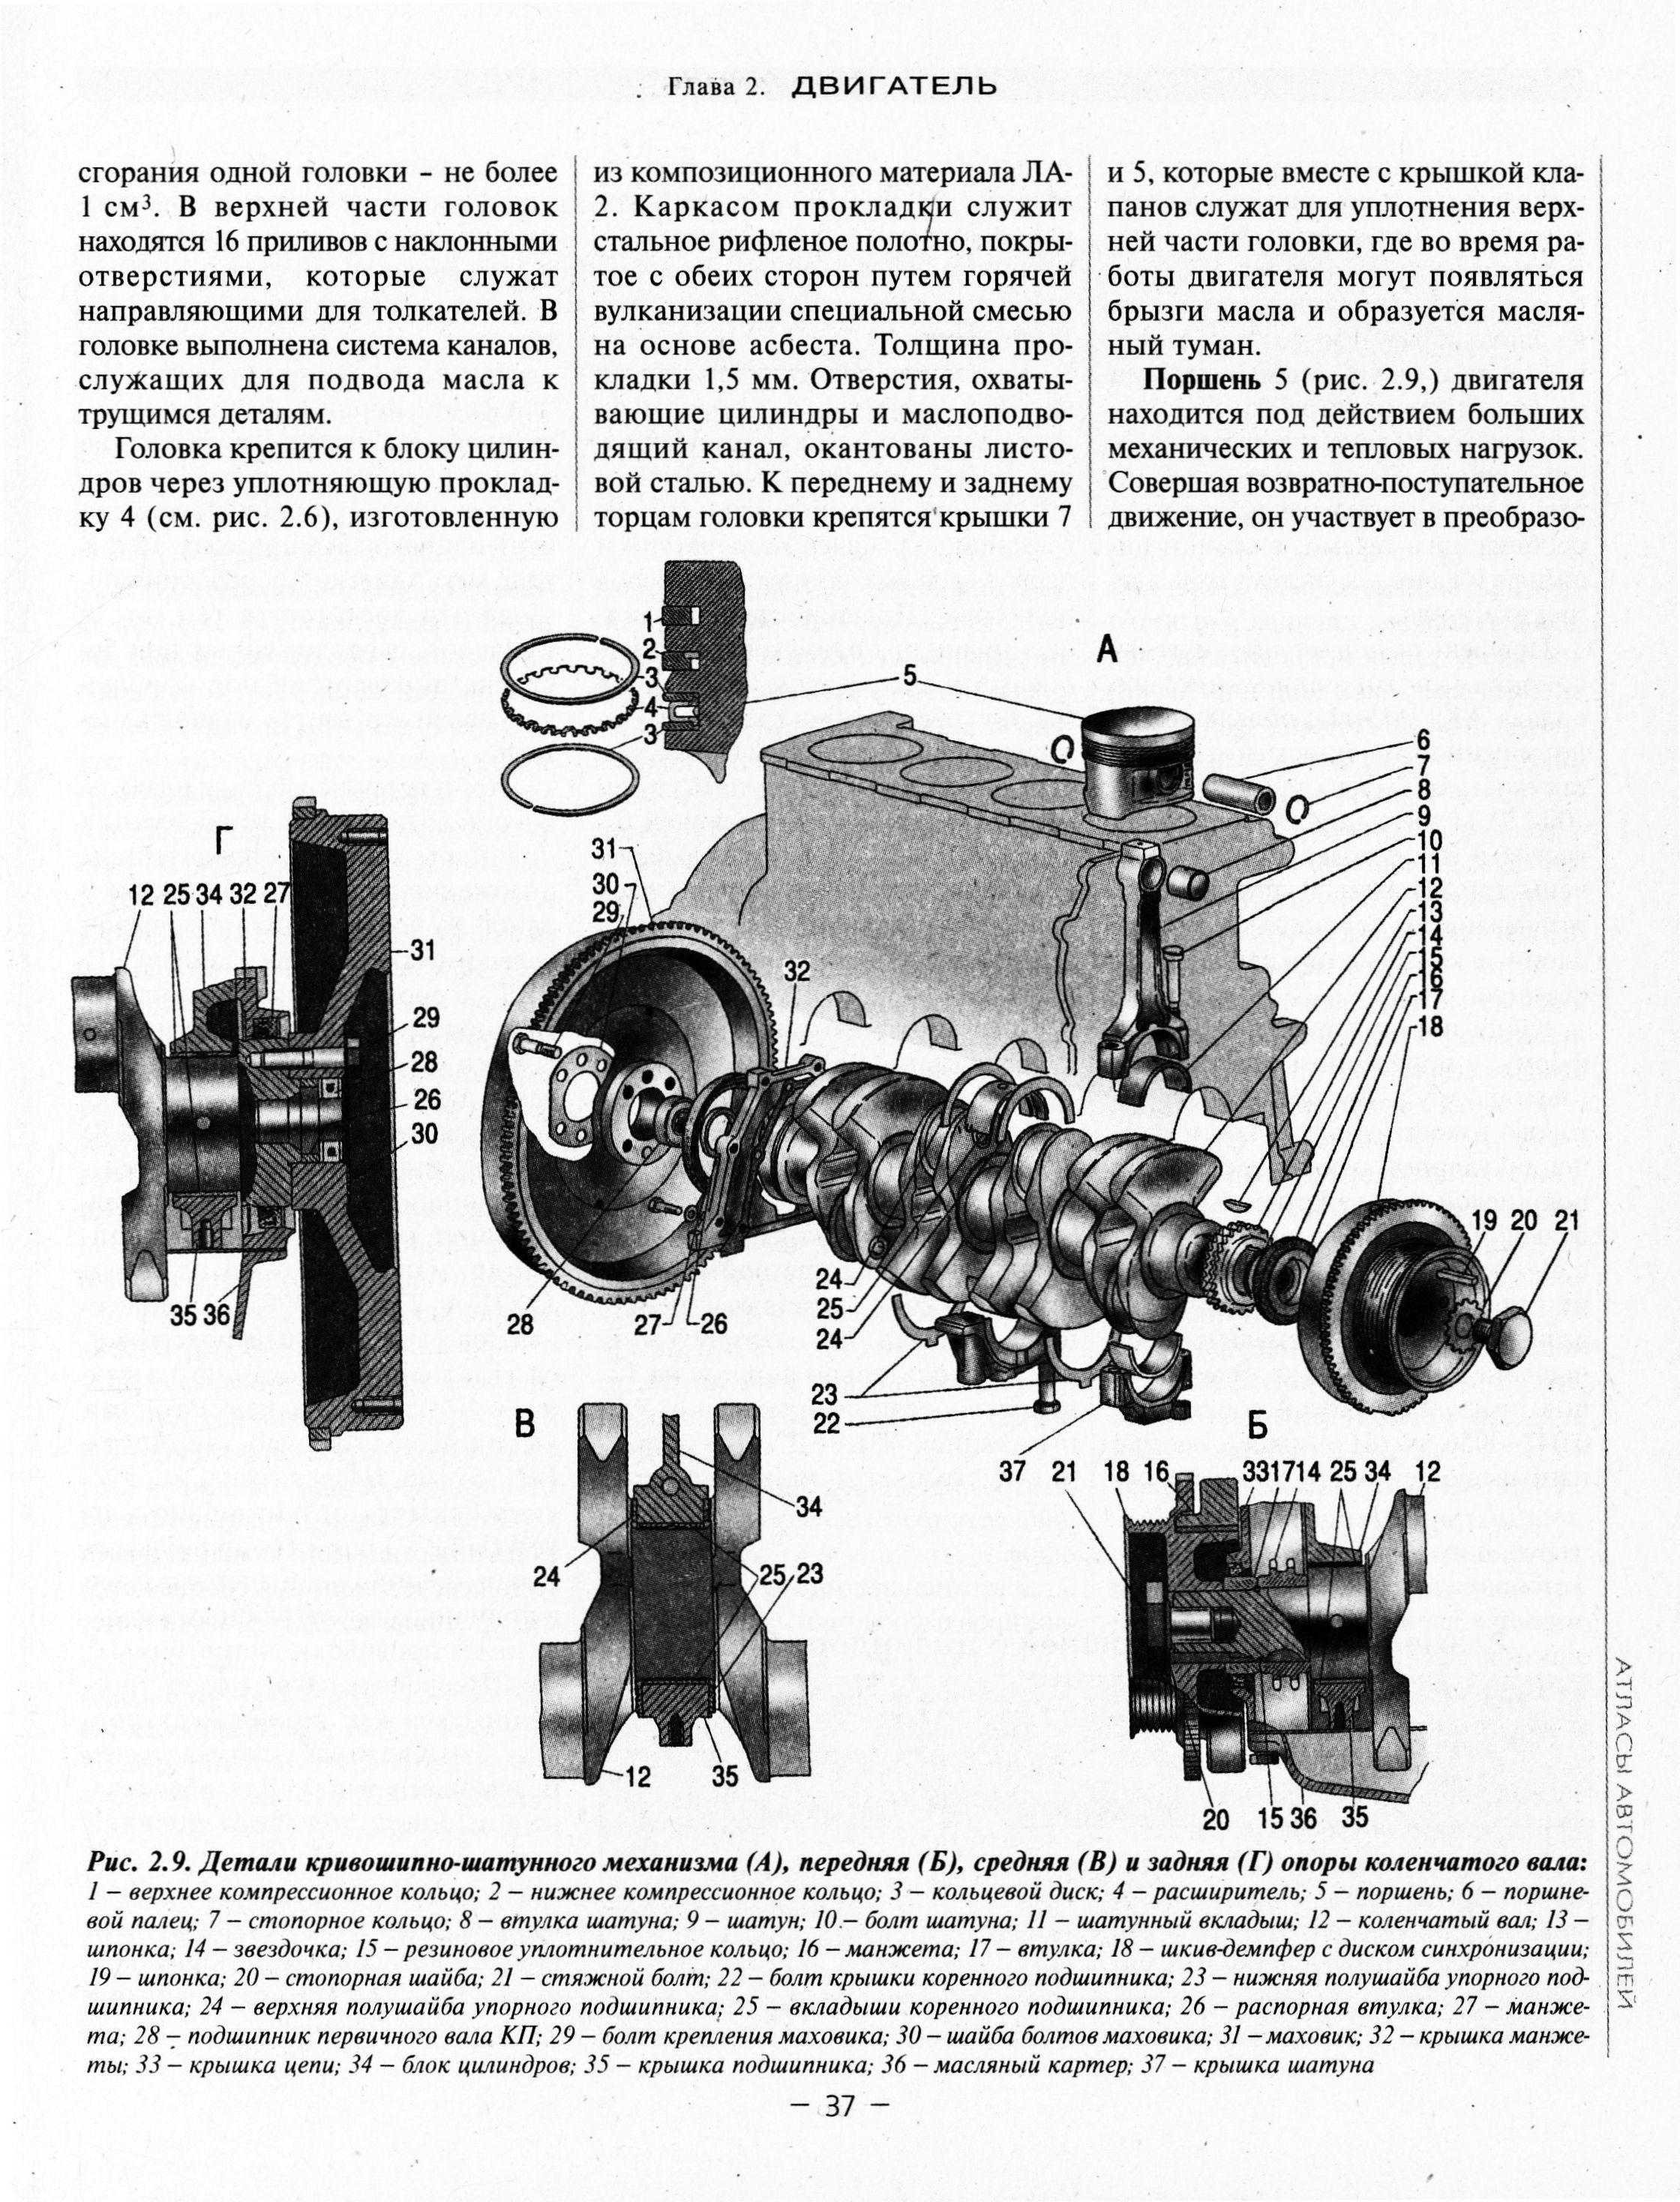 газ 3102 руководство по эксплуатации pdf